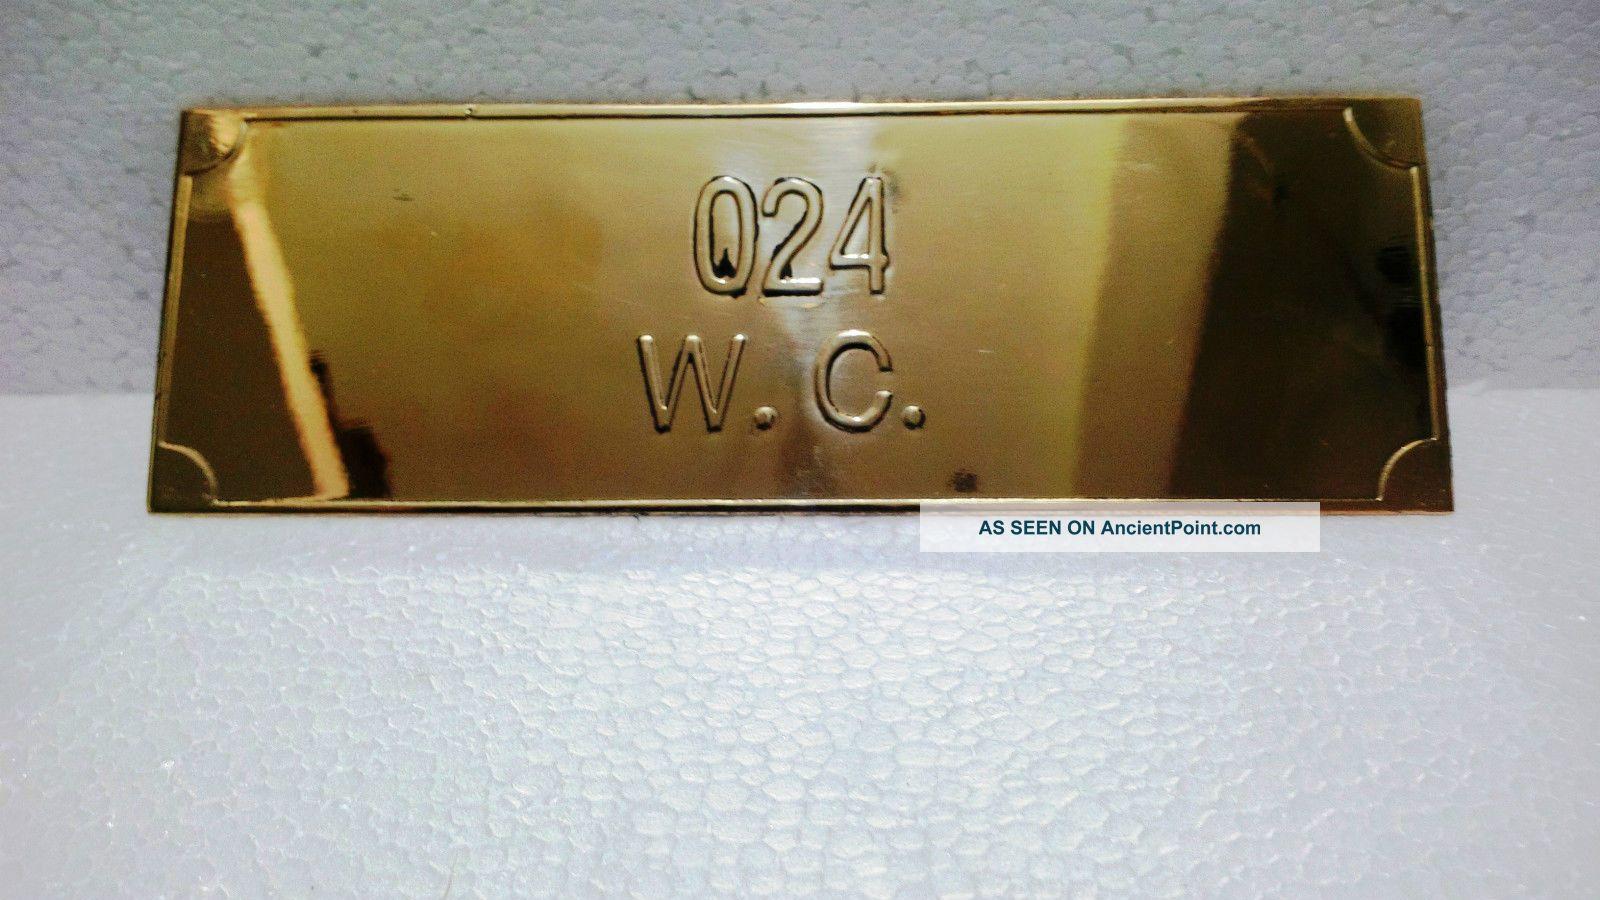 Vintage Maritime Marine Ship Plaque & Signs Brass Door Number Plaque Plaques & Signs photo